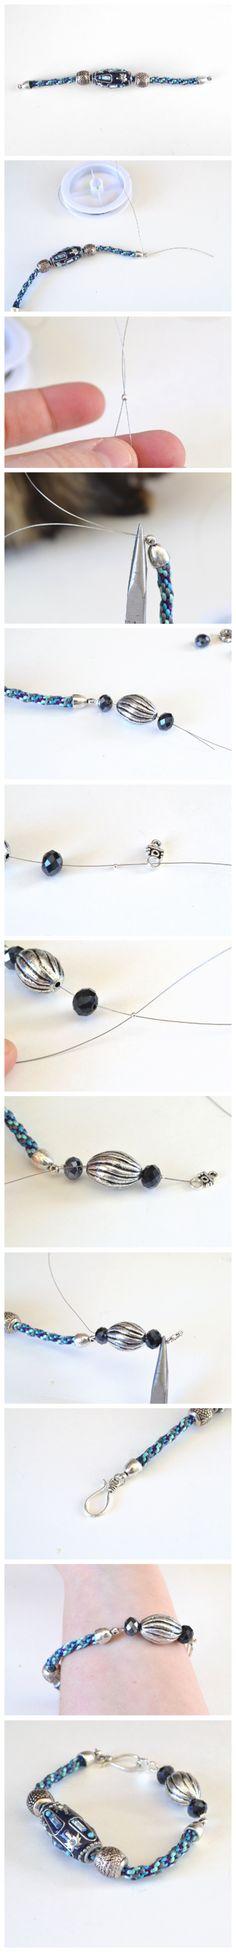 DIY Bracelet Using a Too Short Kumihimo Braid